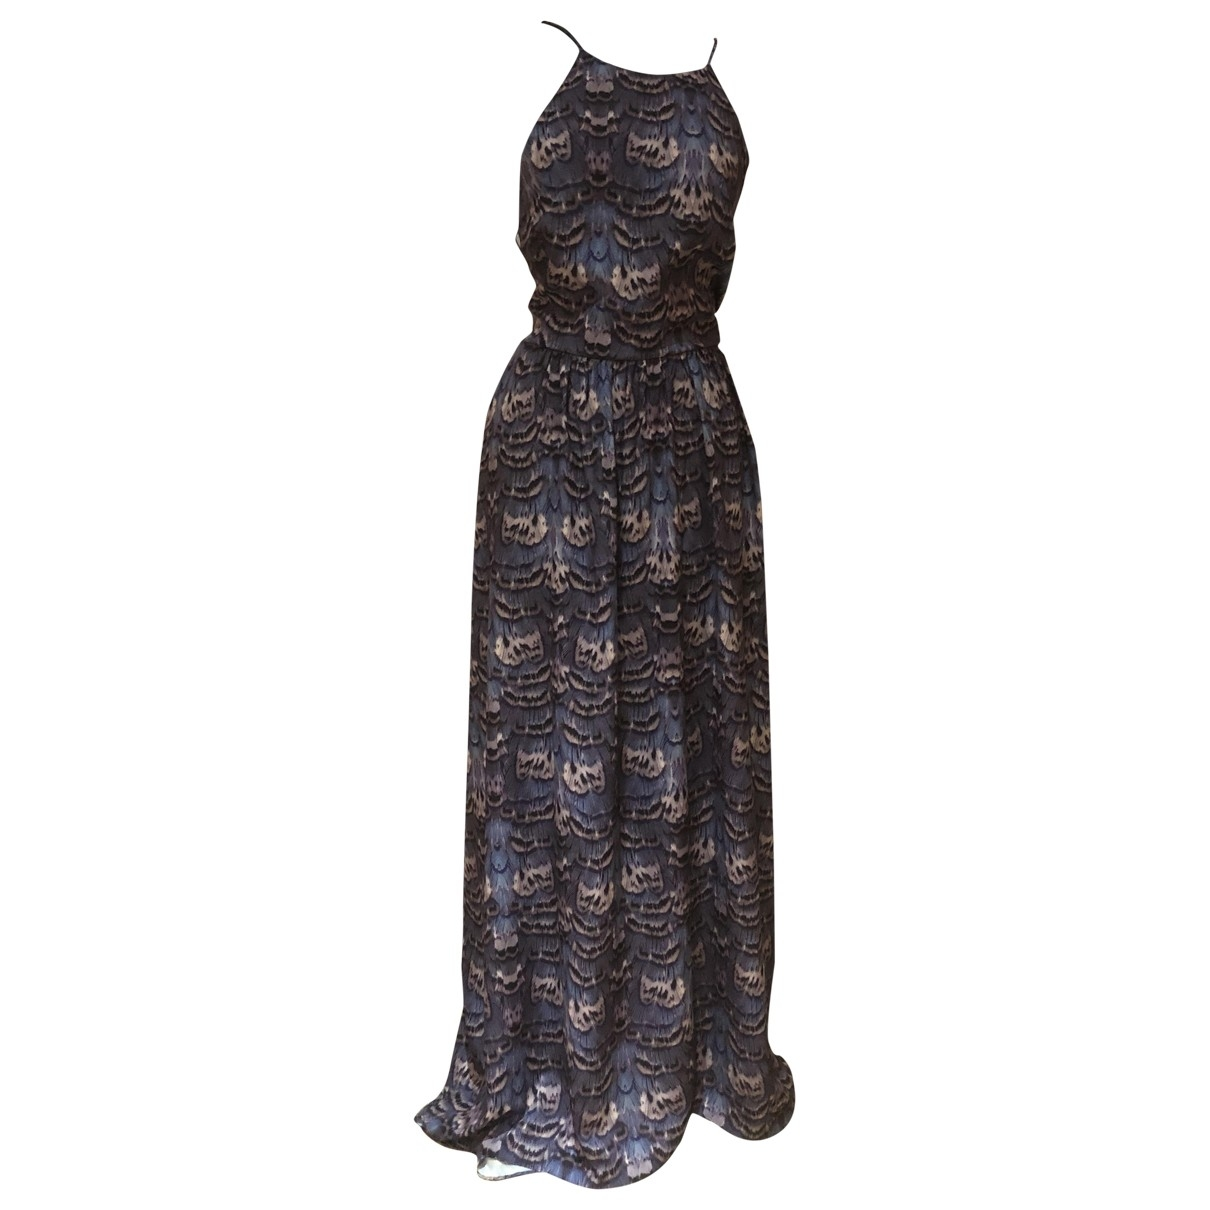 Tibi \N Kleid in  Lila Synthetik